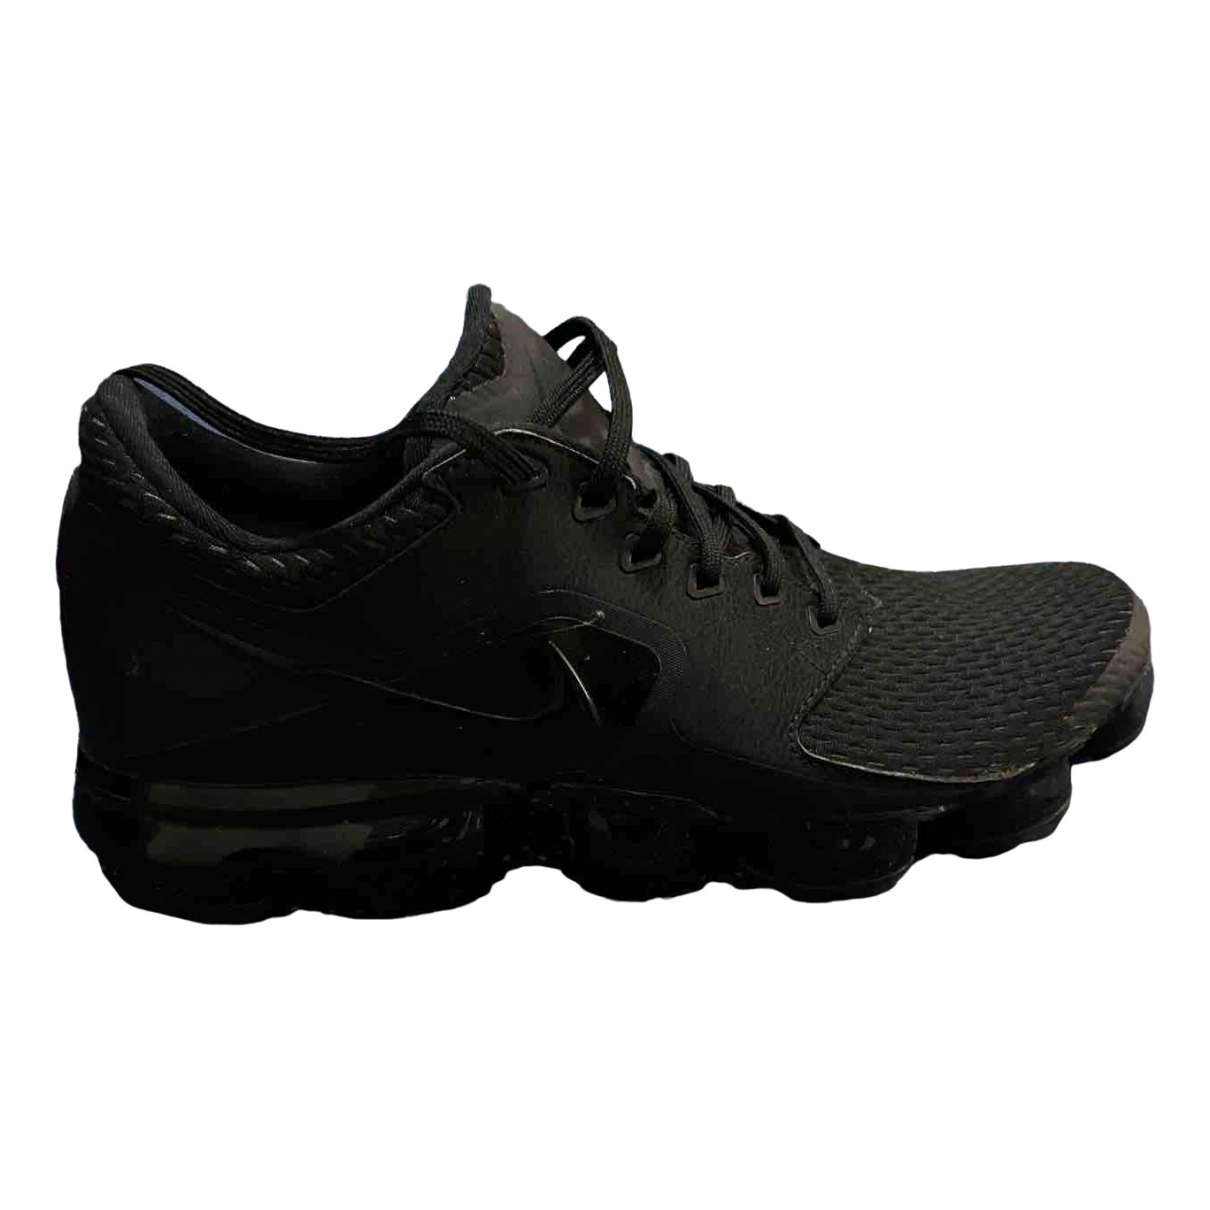 Nike Air VaporMax Black Cloth Trainers for Men 42 EU